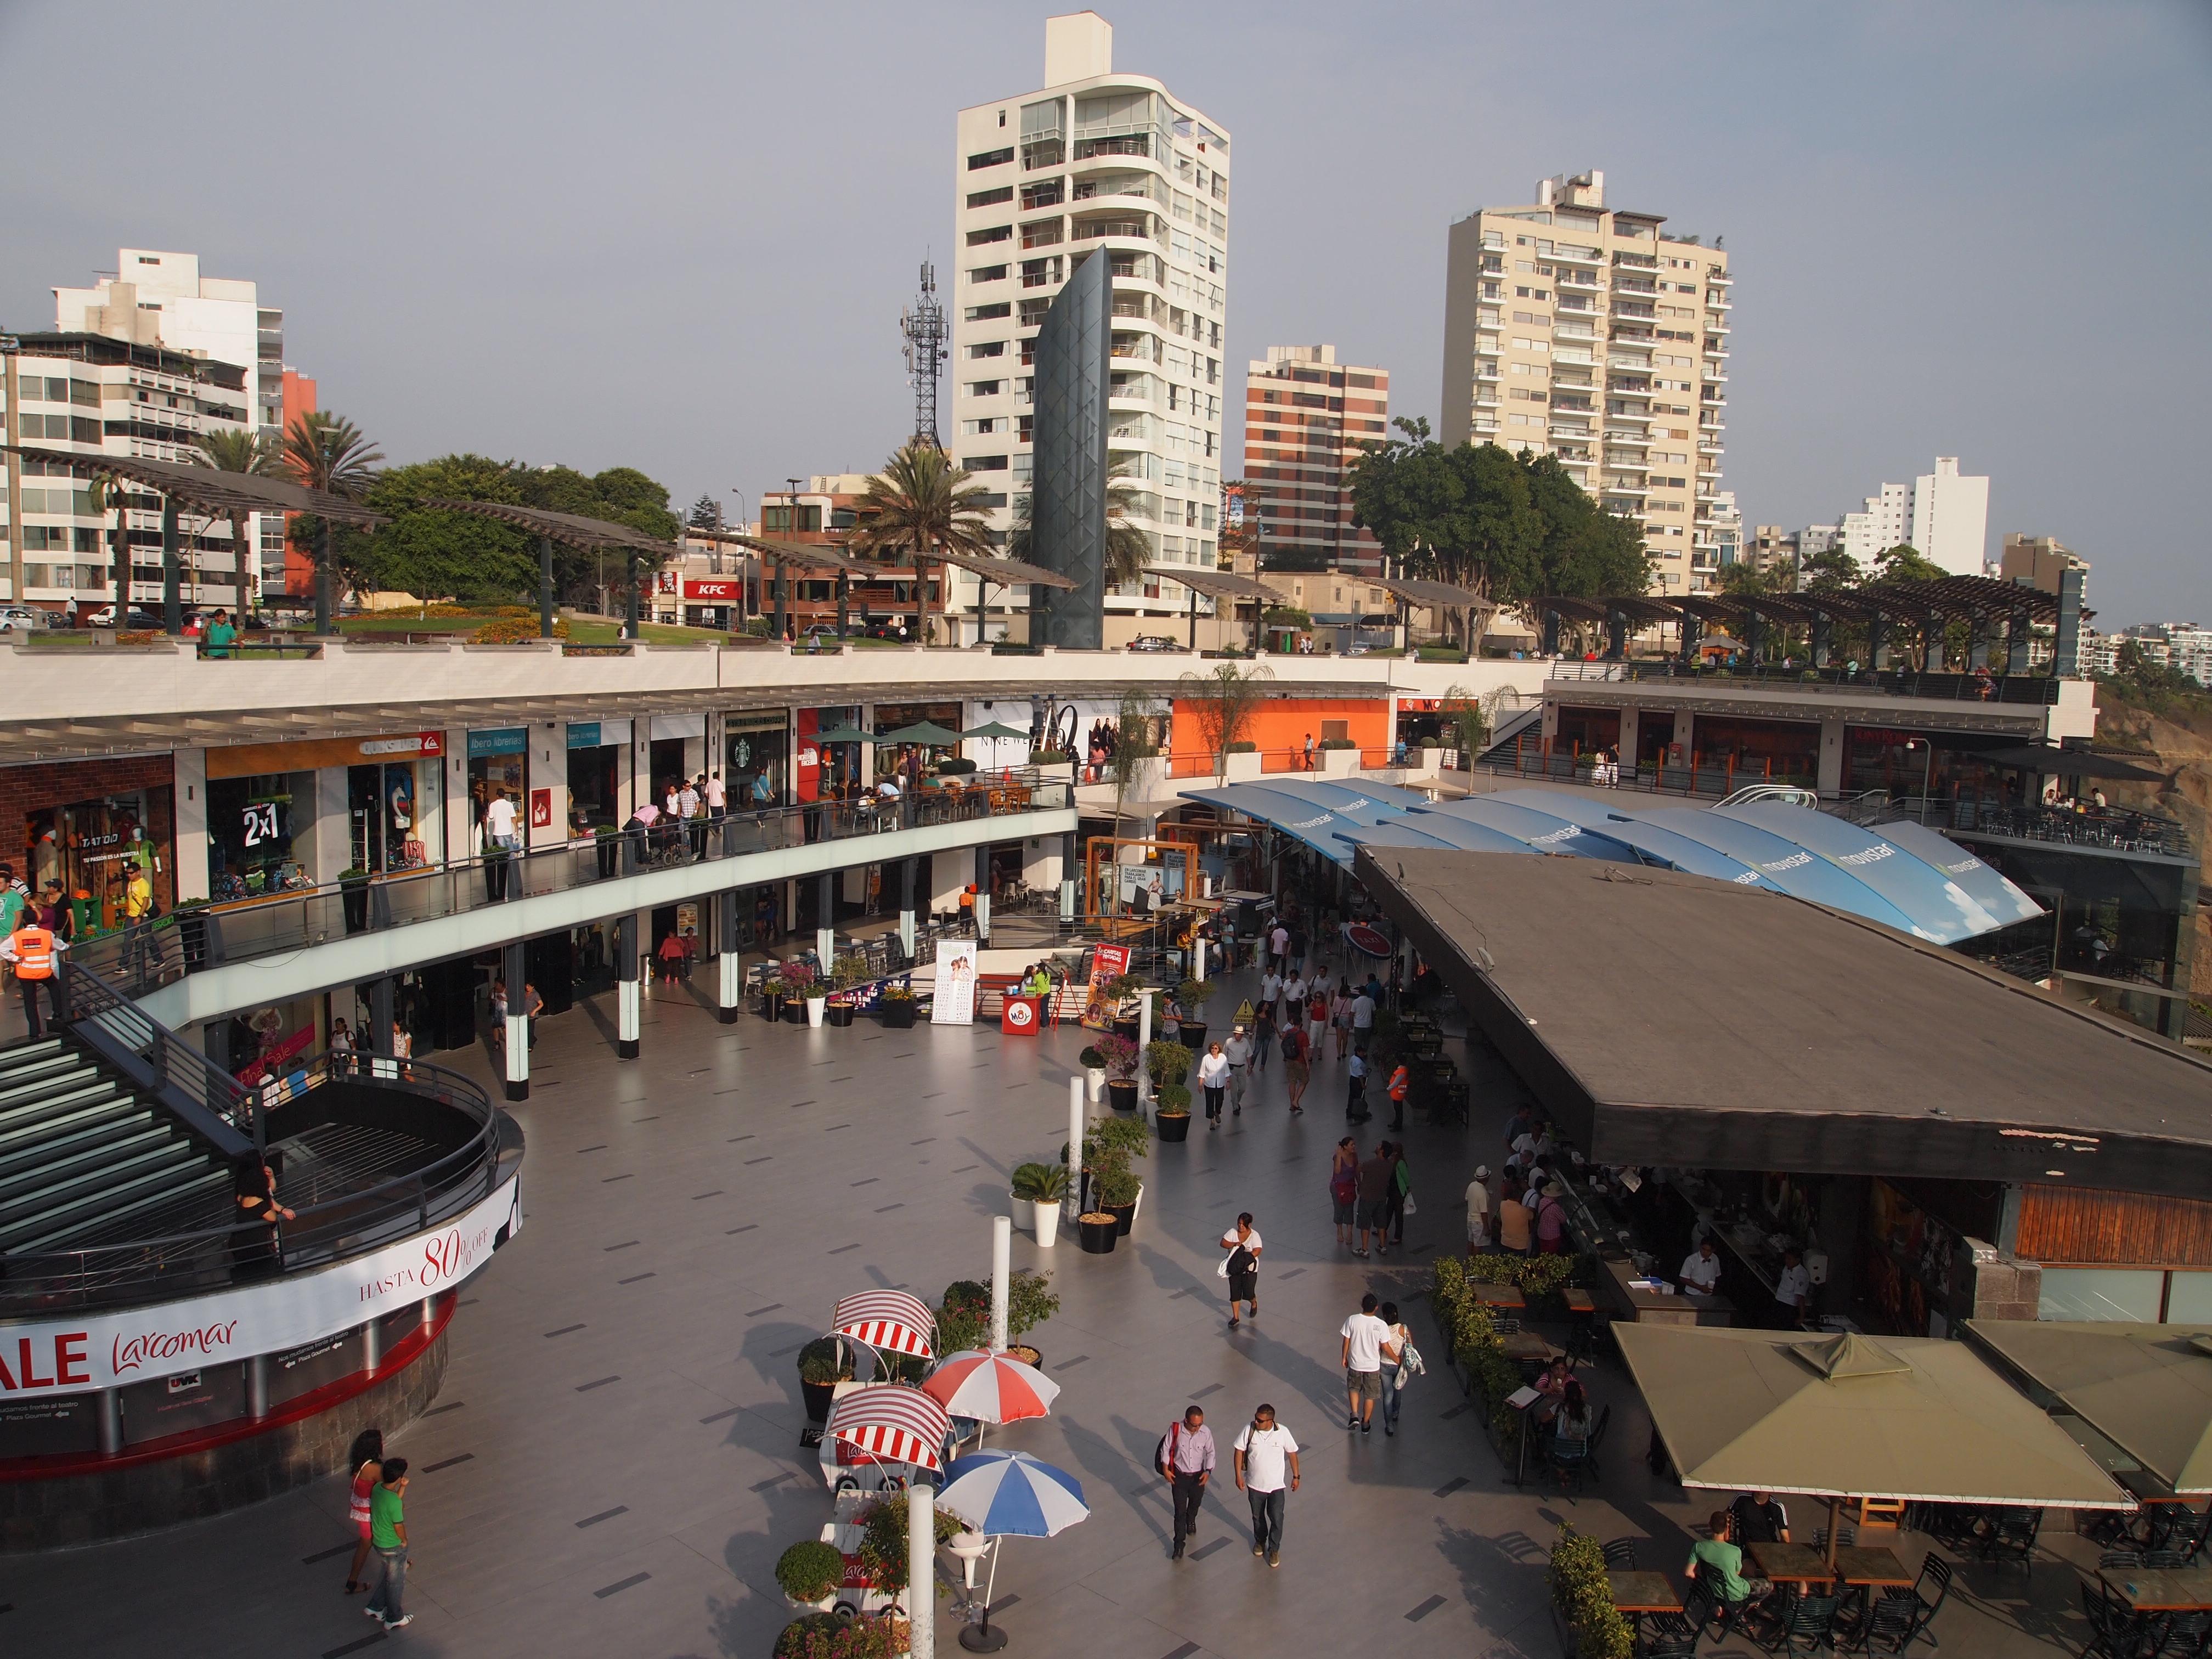 Phenomenal Photos Of Lima Peru Places Boomsbeat